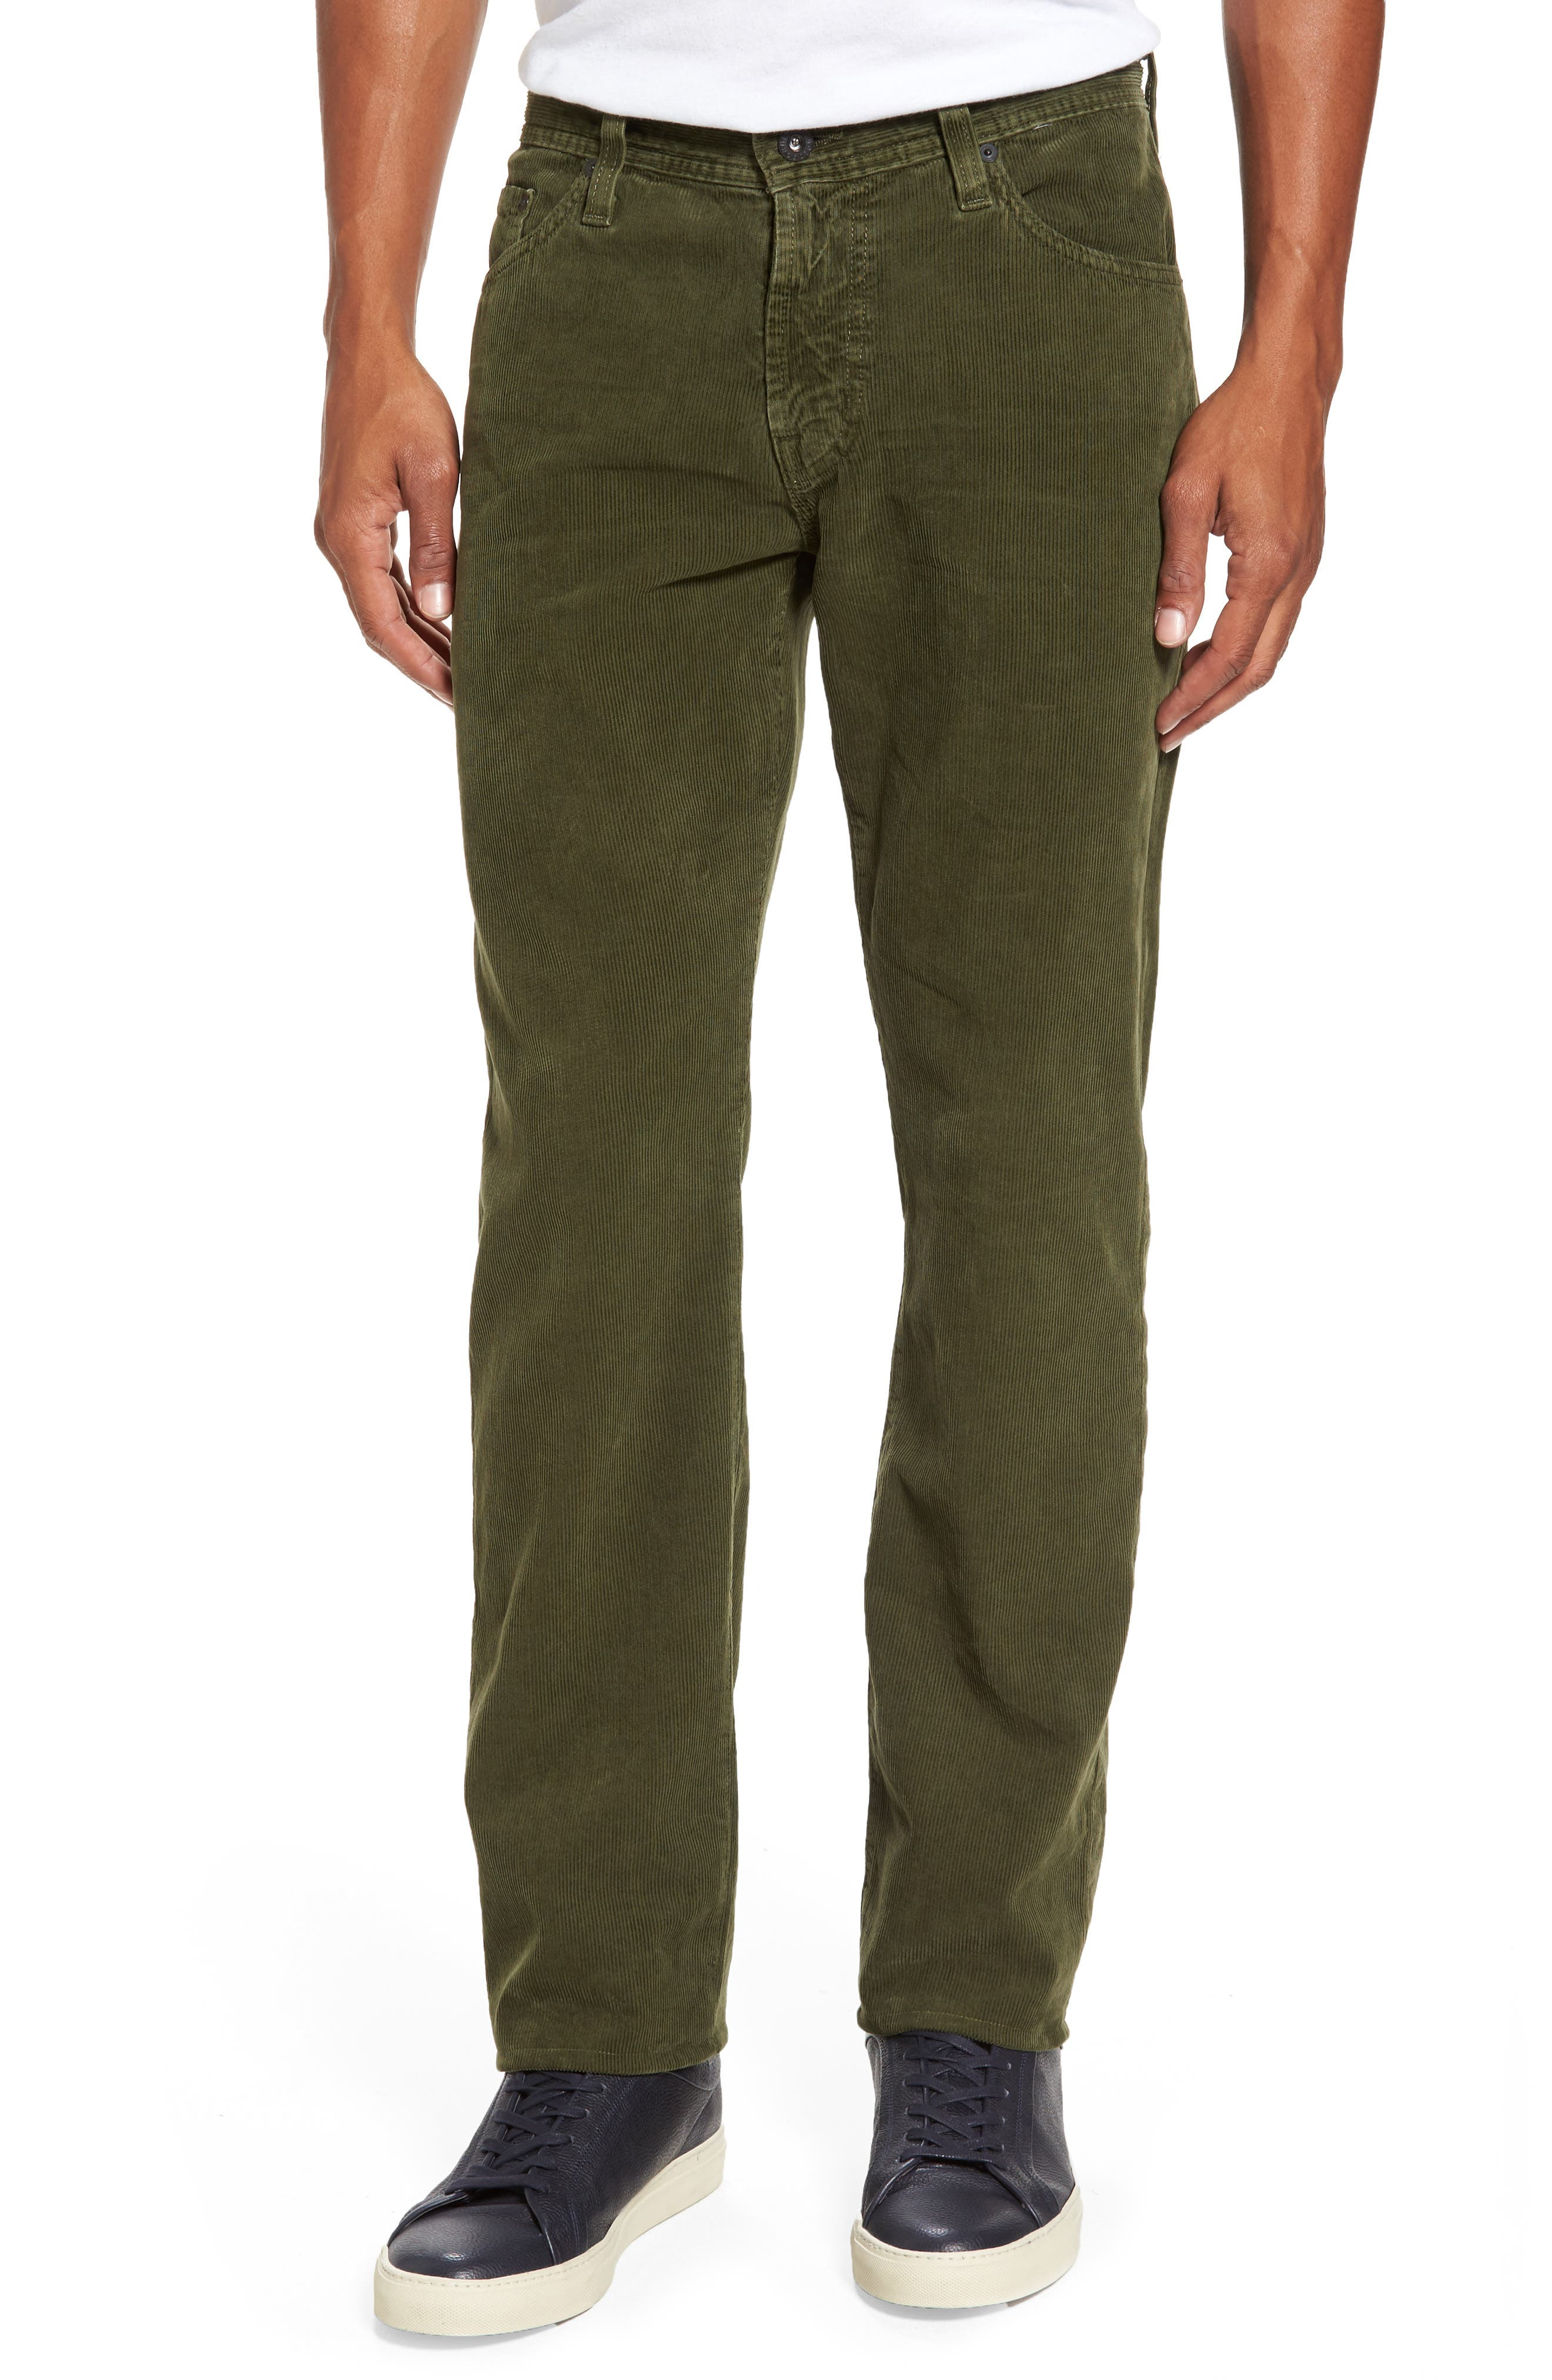 'Graduate' Tailored Straight Leg Corduroy Pants,                         Main,                         color, Sulfur Climbing Ivy